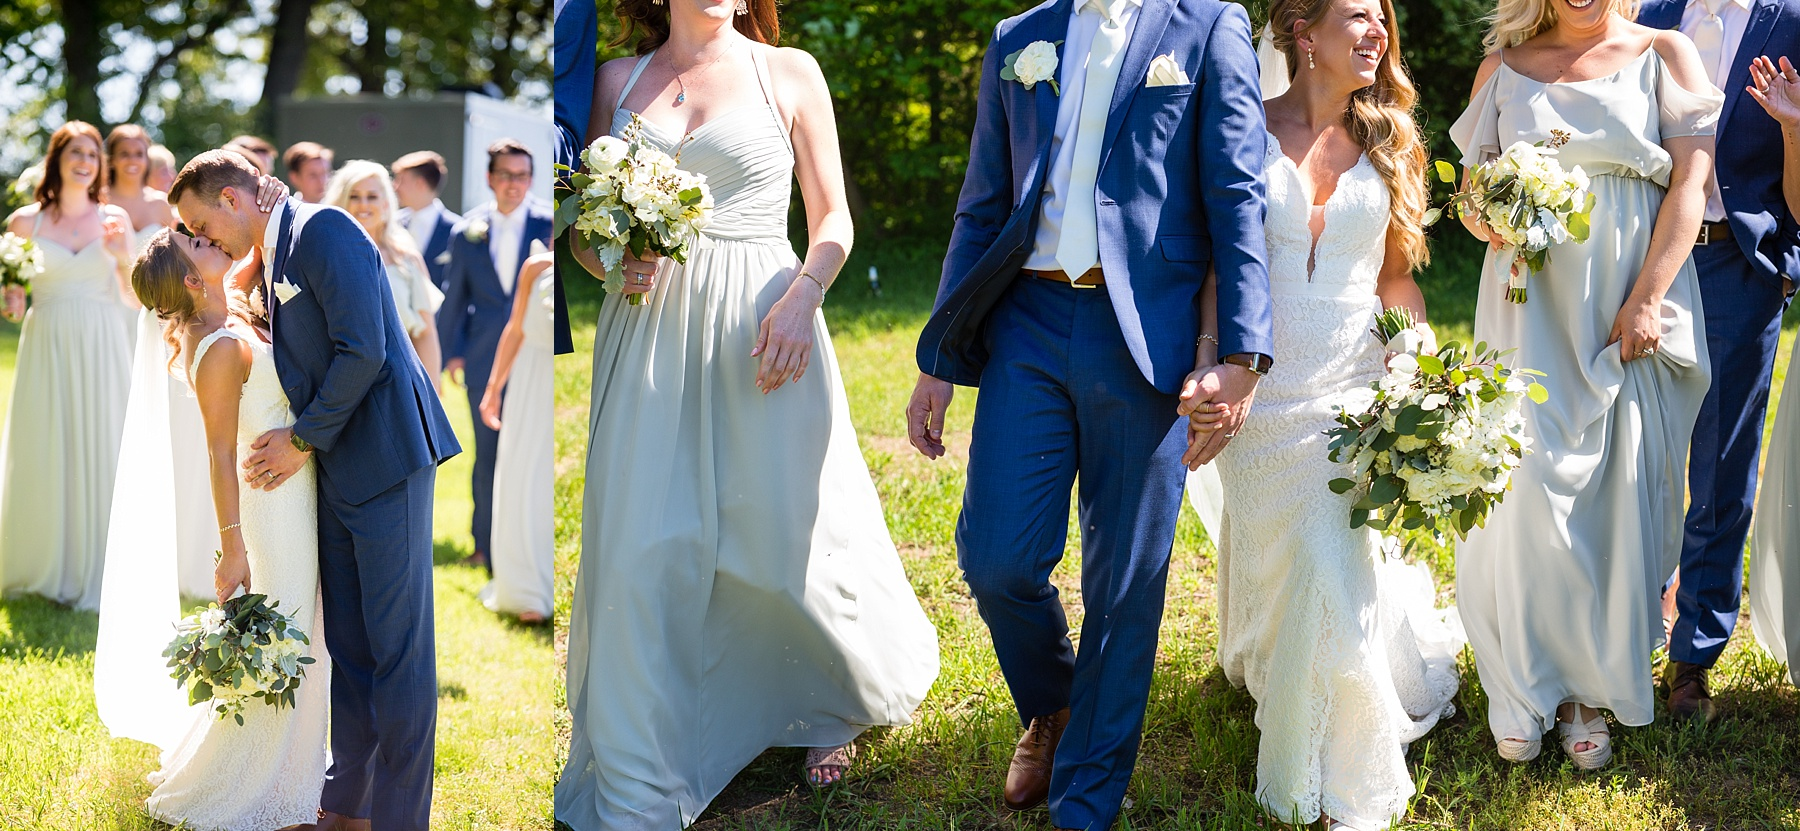 Brandon_Shafer_Photography_Kara_Doug_12_corners_Wedding_Benton_Harbor_0047.jpg